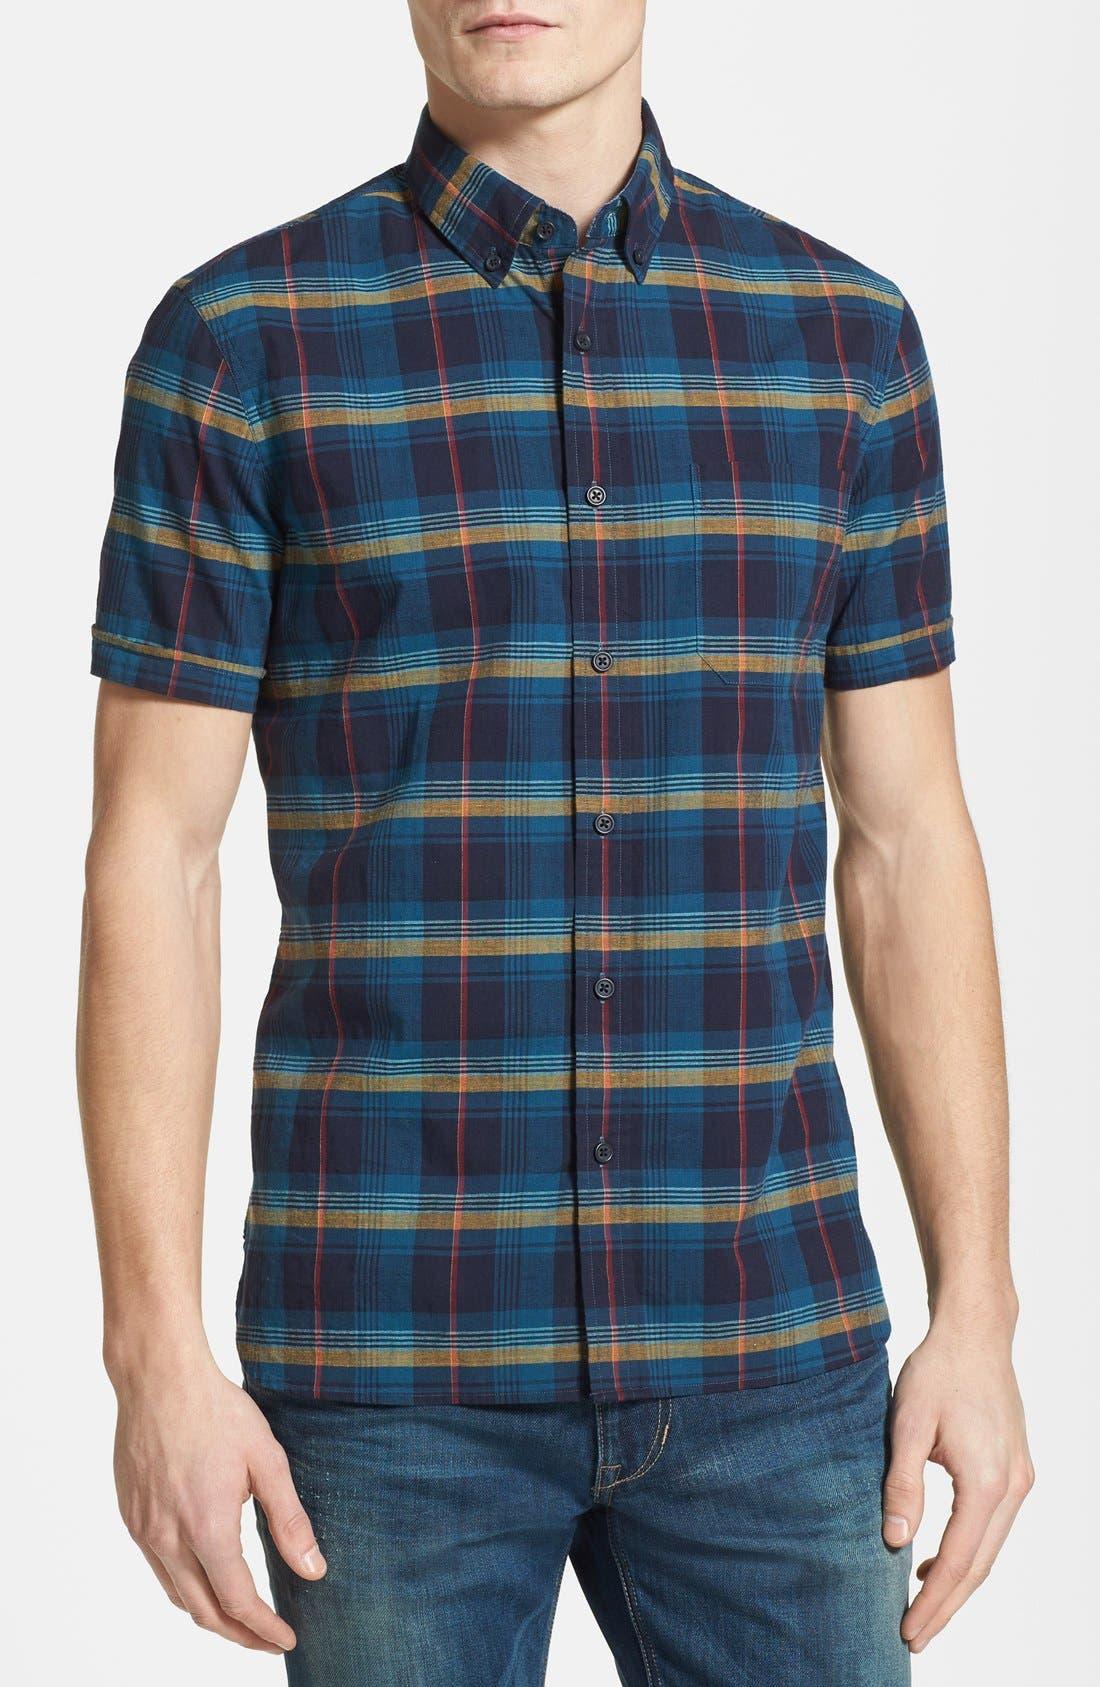 Main Image - Wallin & Bros. 'Signature' Trim Fit Short Sleeve Madras Sport Shirt